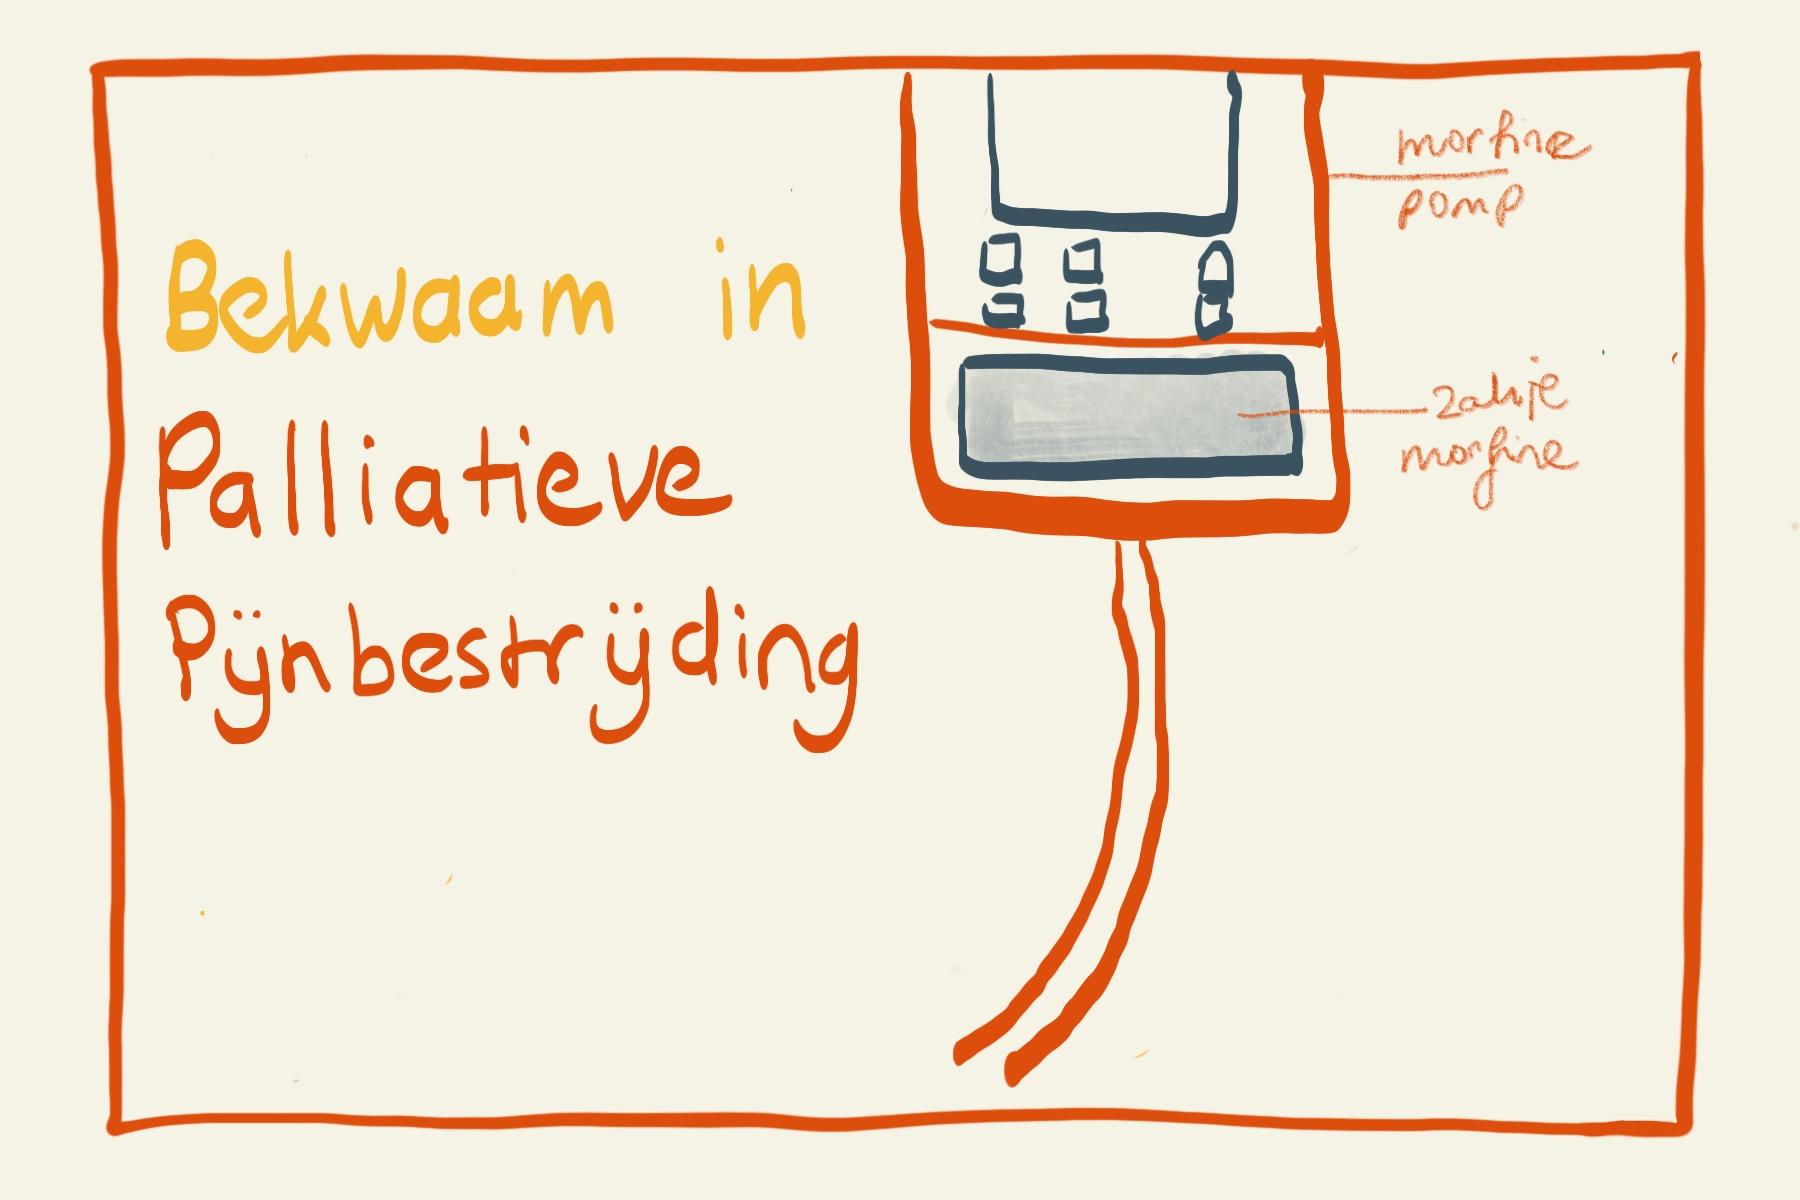 e-learning Palliatieve Pijnbestrijding